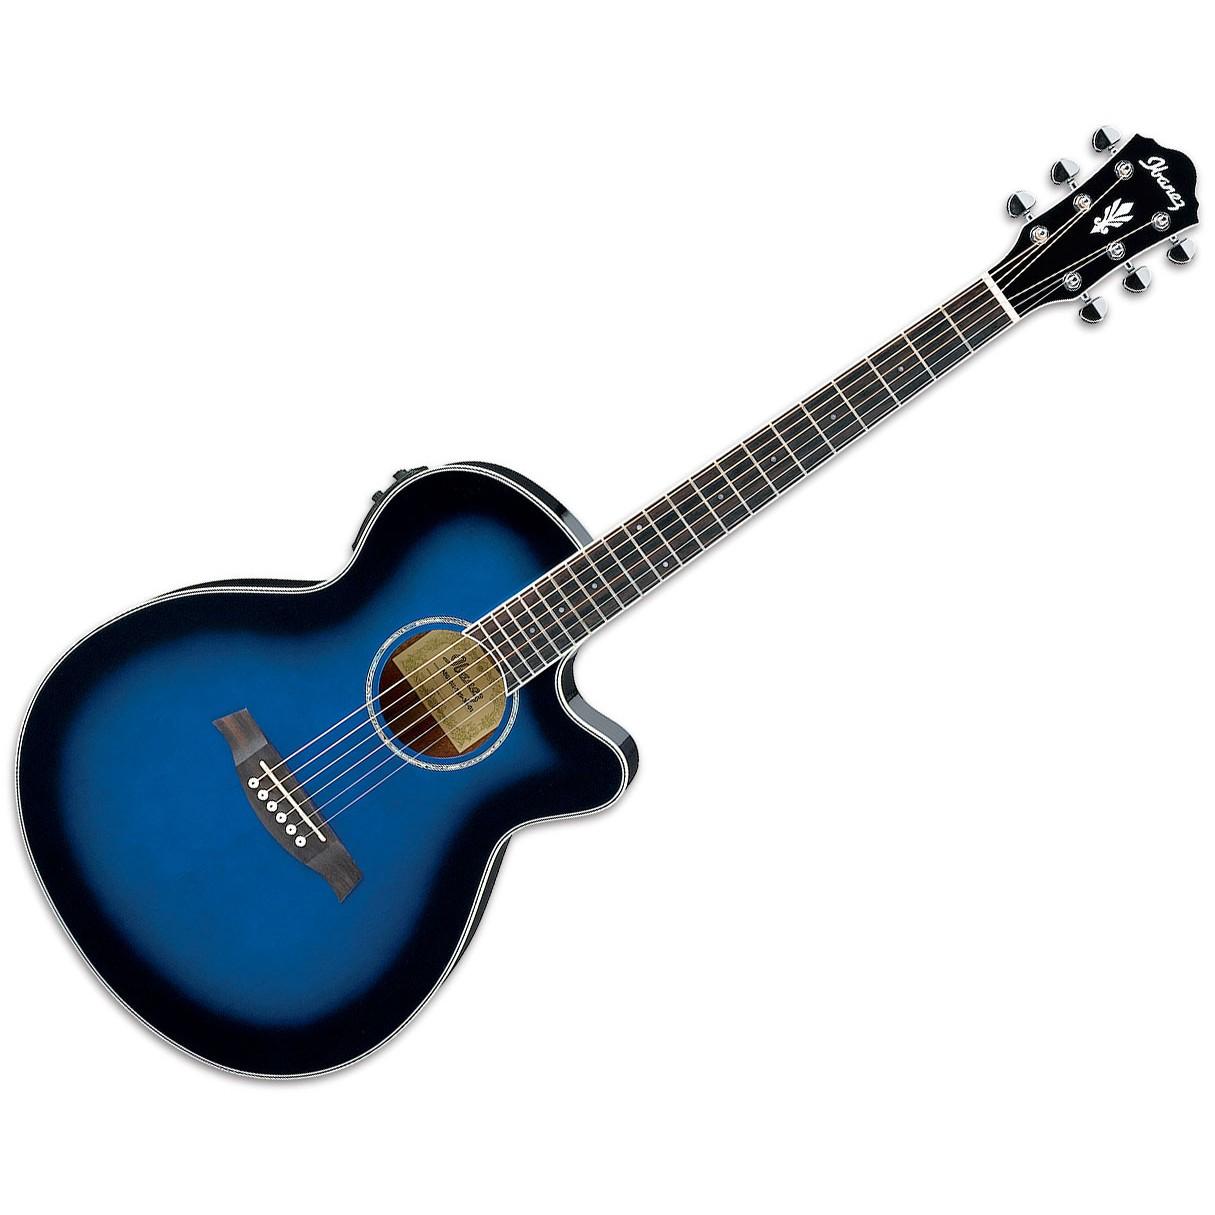 ibanez aeg10ii 6 string acoustic electric guitar transparent blue sunburst gloss. Black Bedroom Furniture Sets. Home Design Ideas